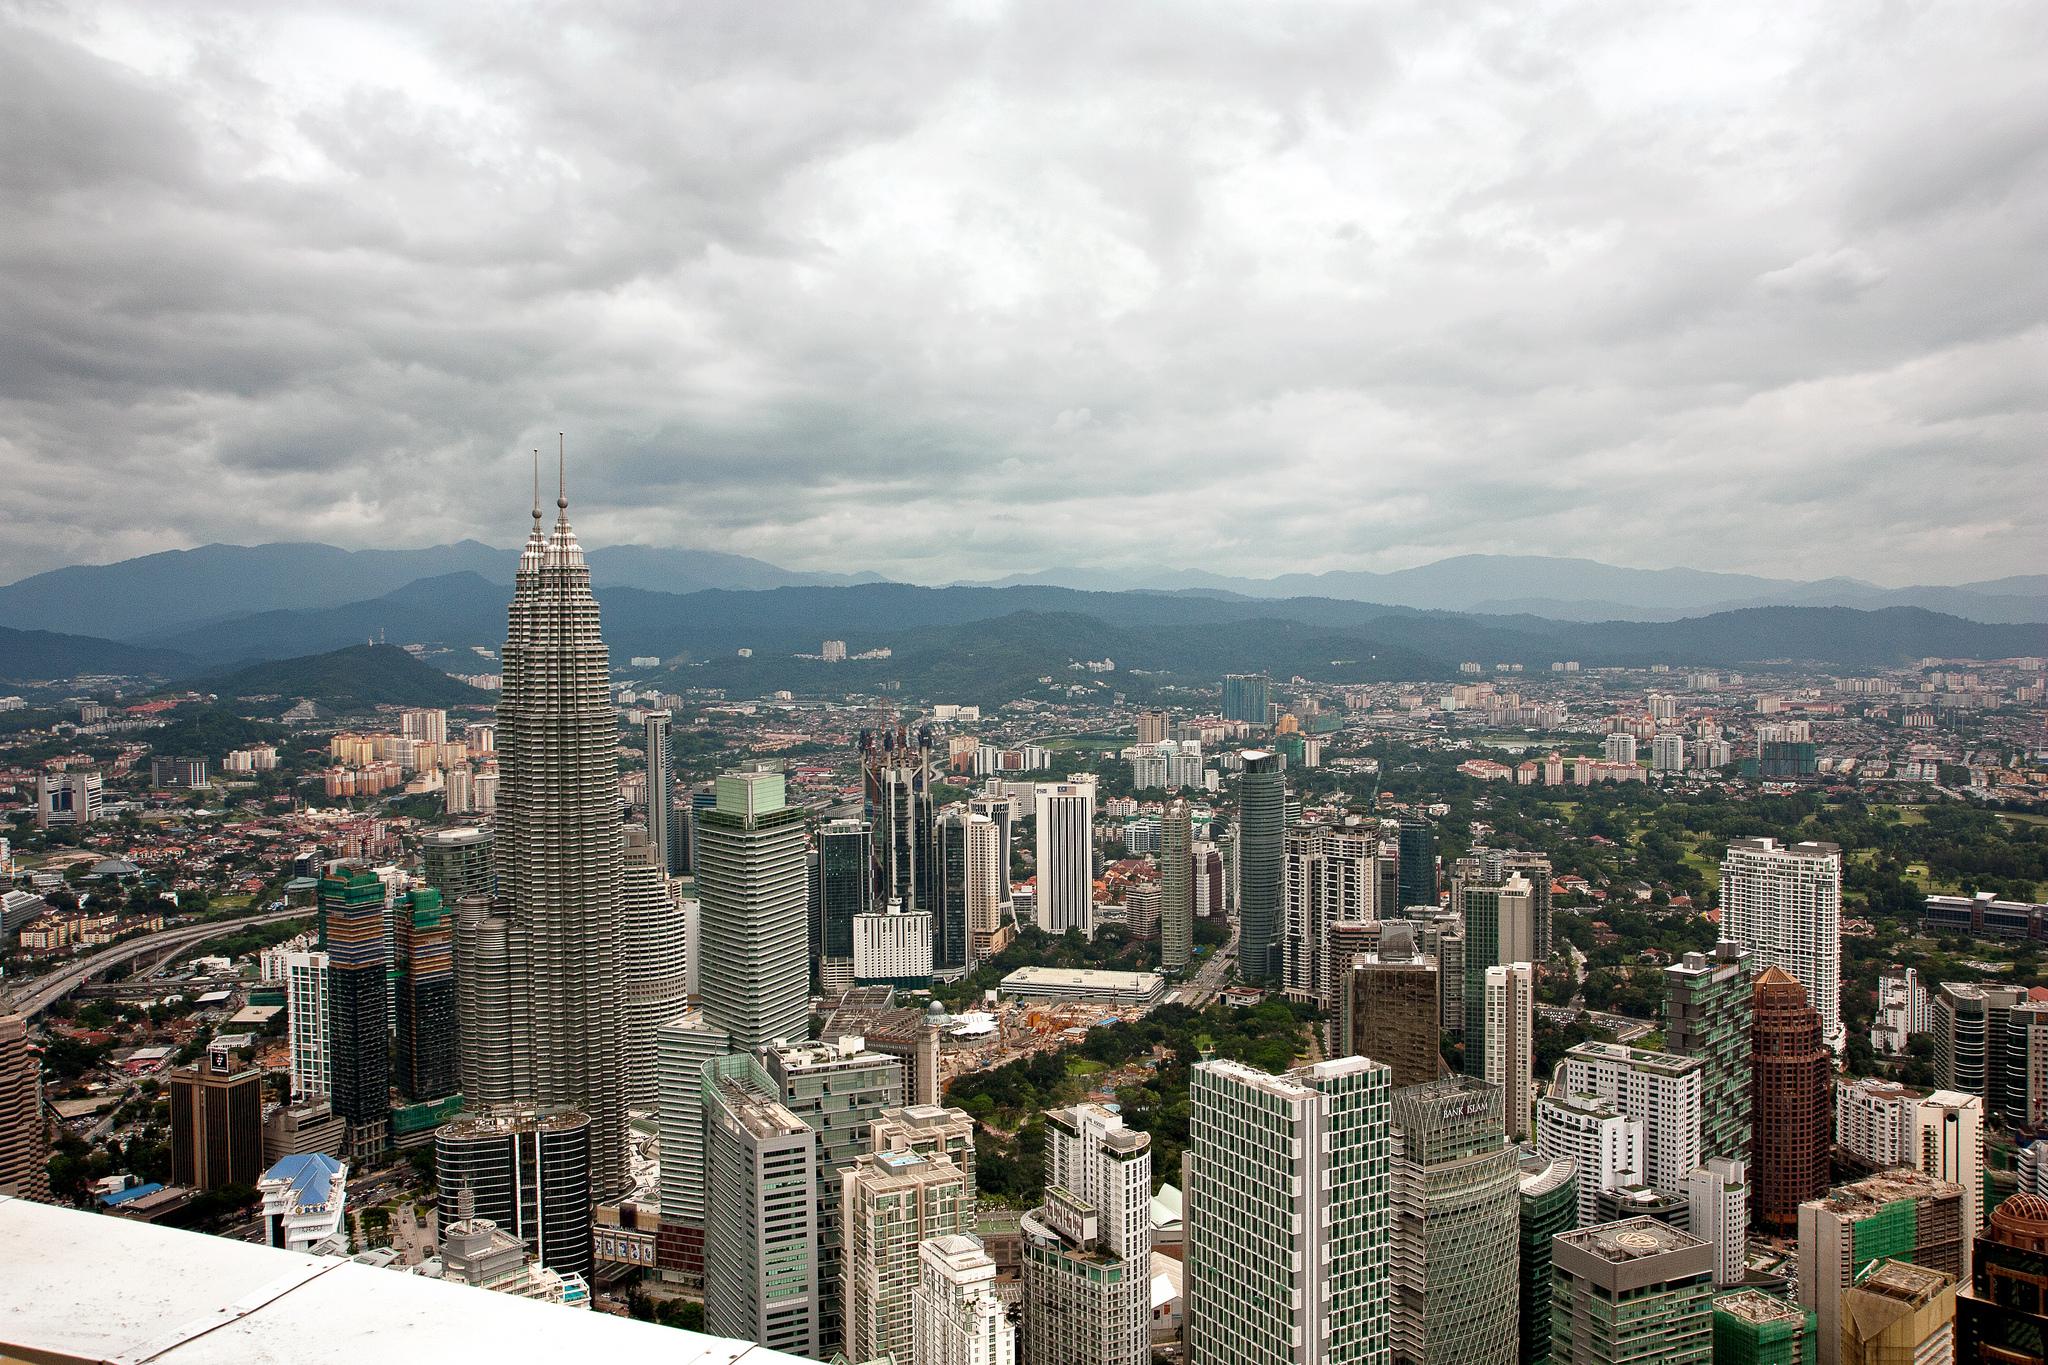 Kuala Lumpur Shopping 10 Best Places For A Bargain Cnn Travel Open Trip Singapore